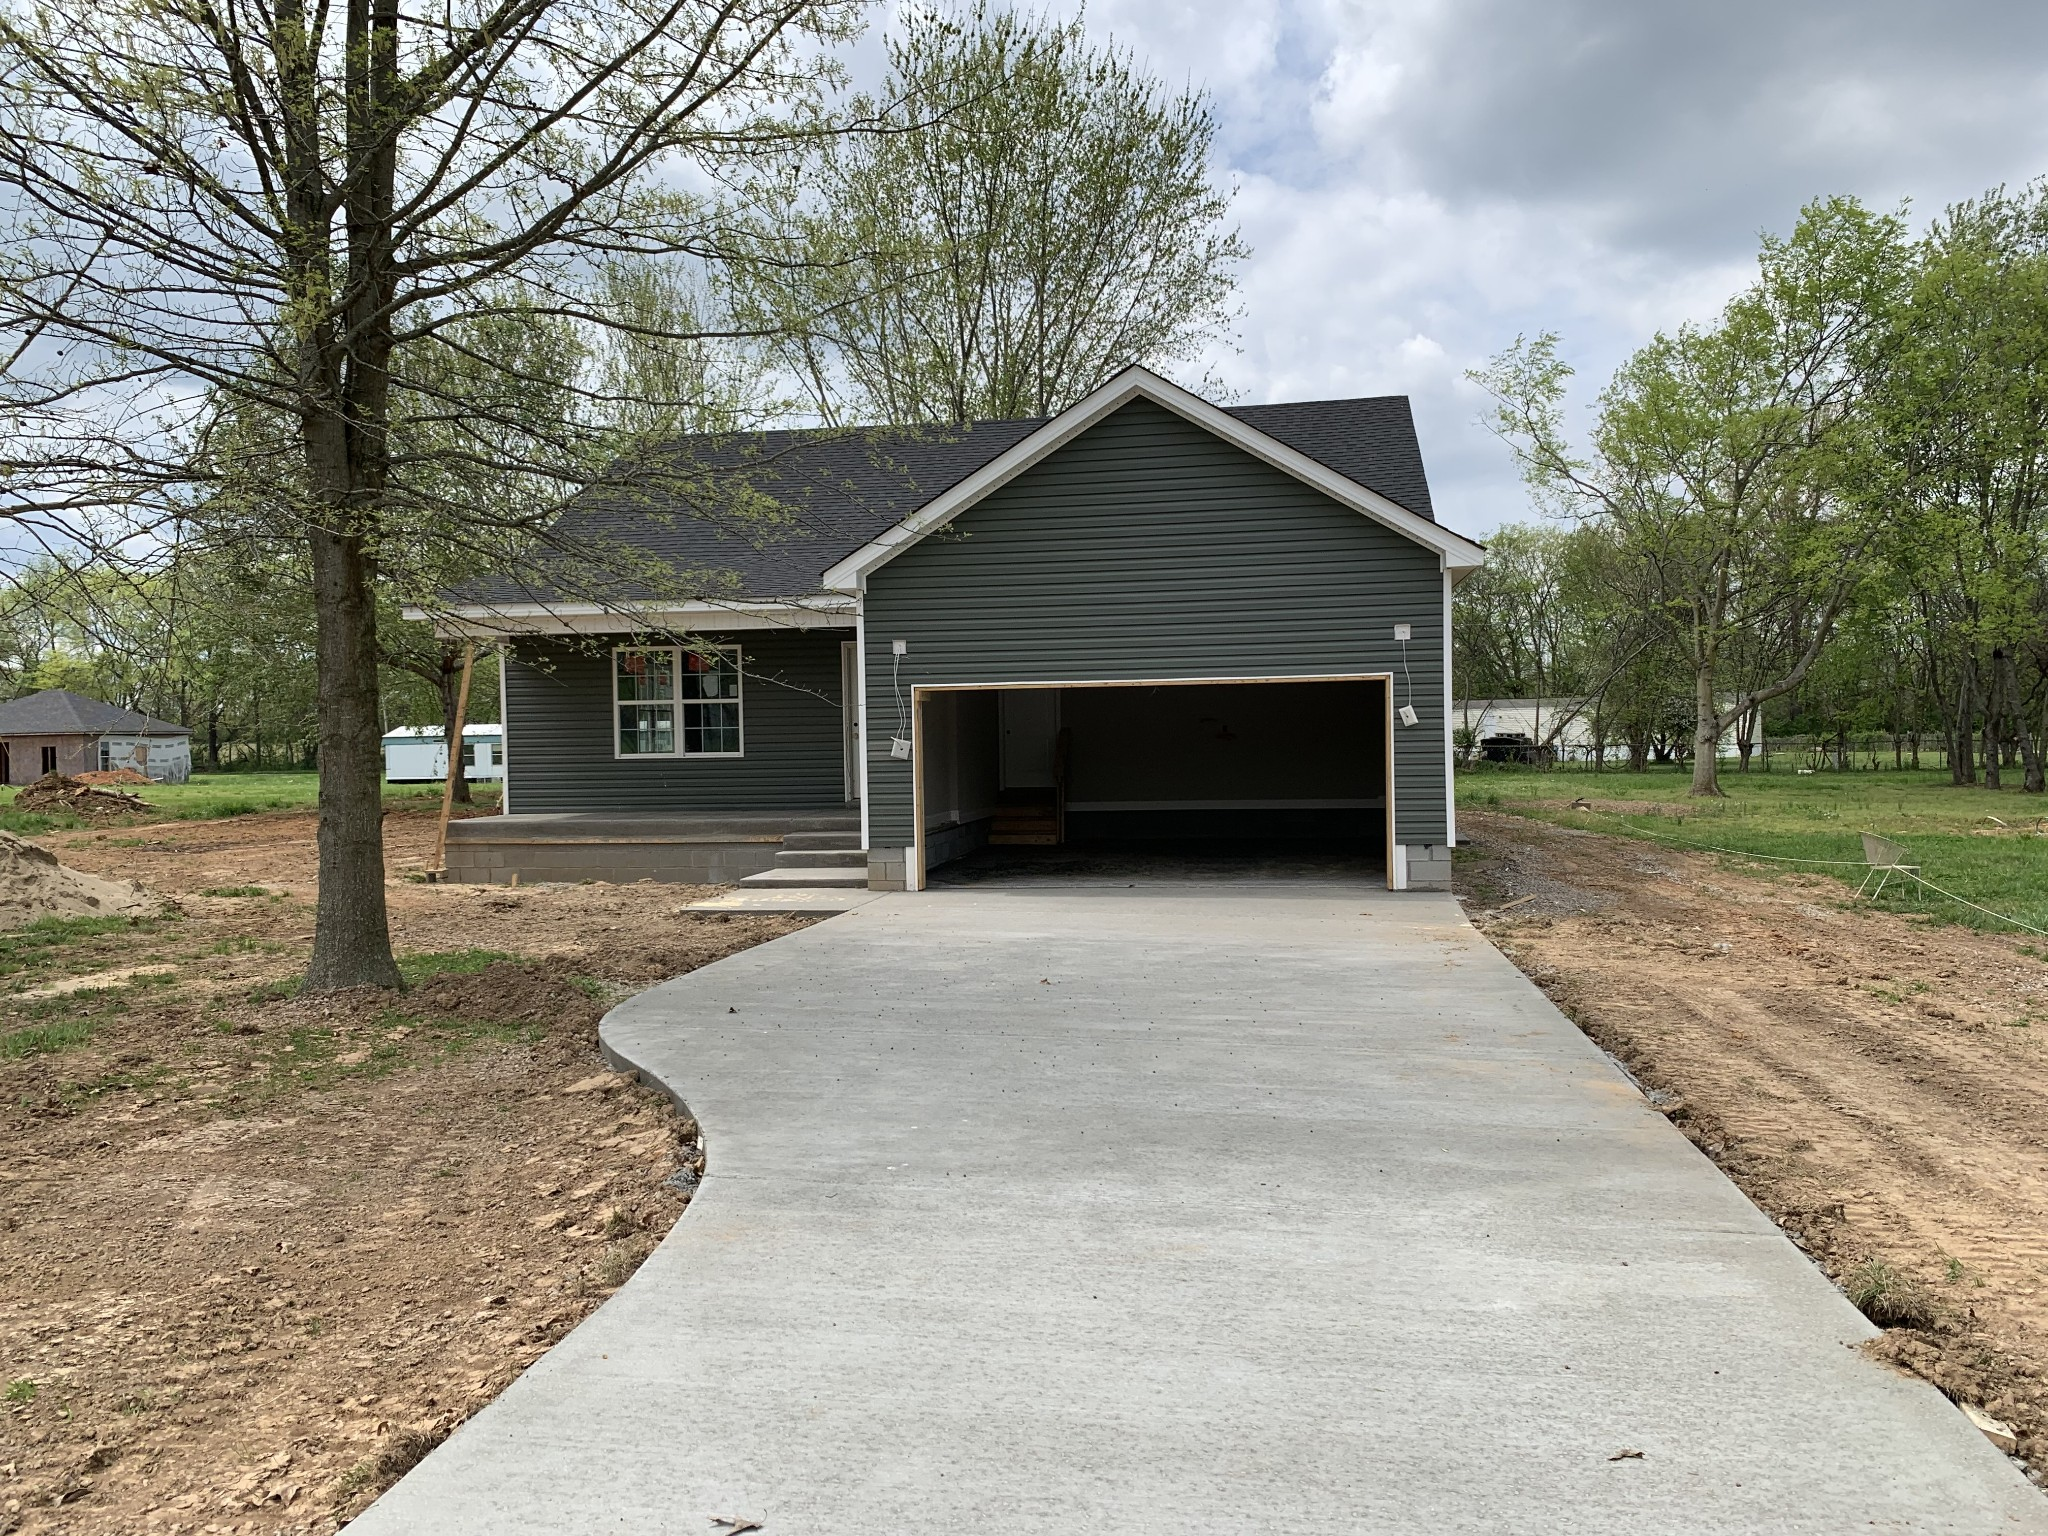 235 Alabama Avenue, Oak Grove, KY 42262 - Oak Grove, KY real estate listing